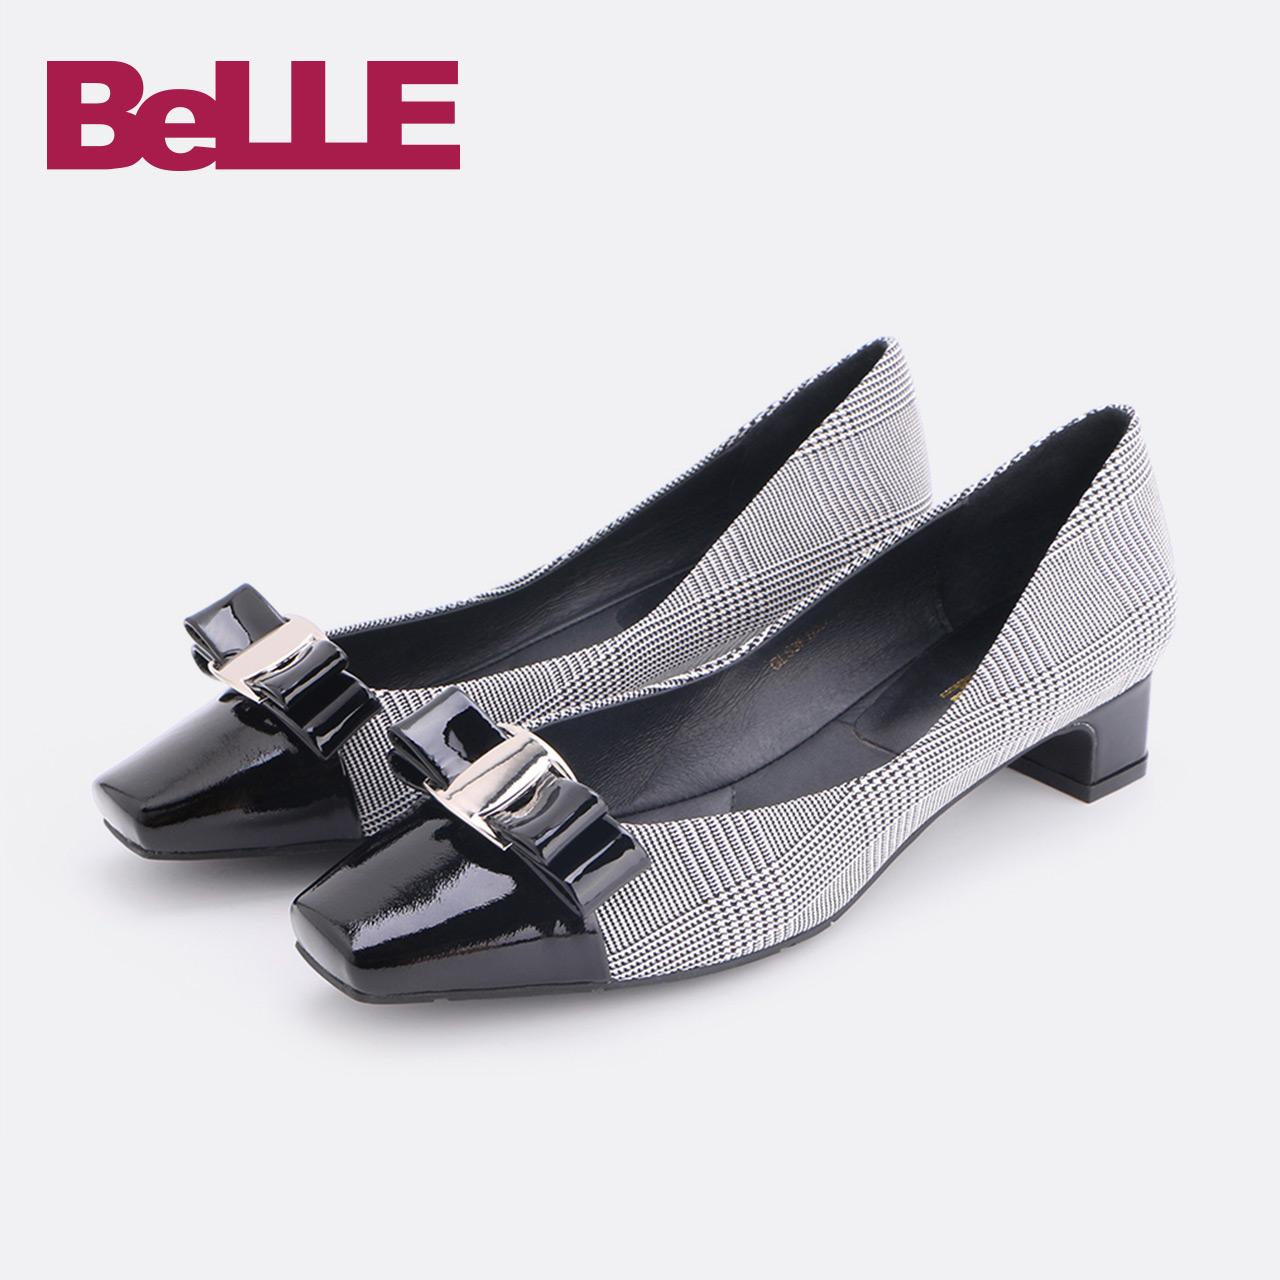 Belle-百丽单鞋2018春新款商场同款漆牛皮女布鞋S3F1DAQ8